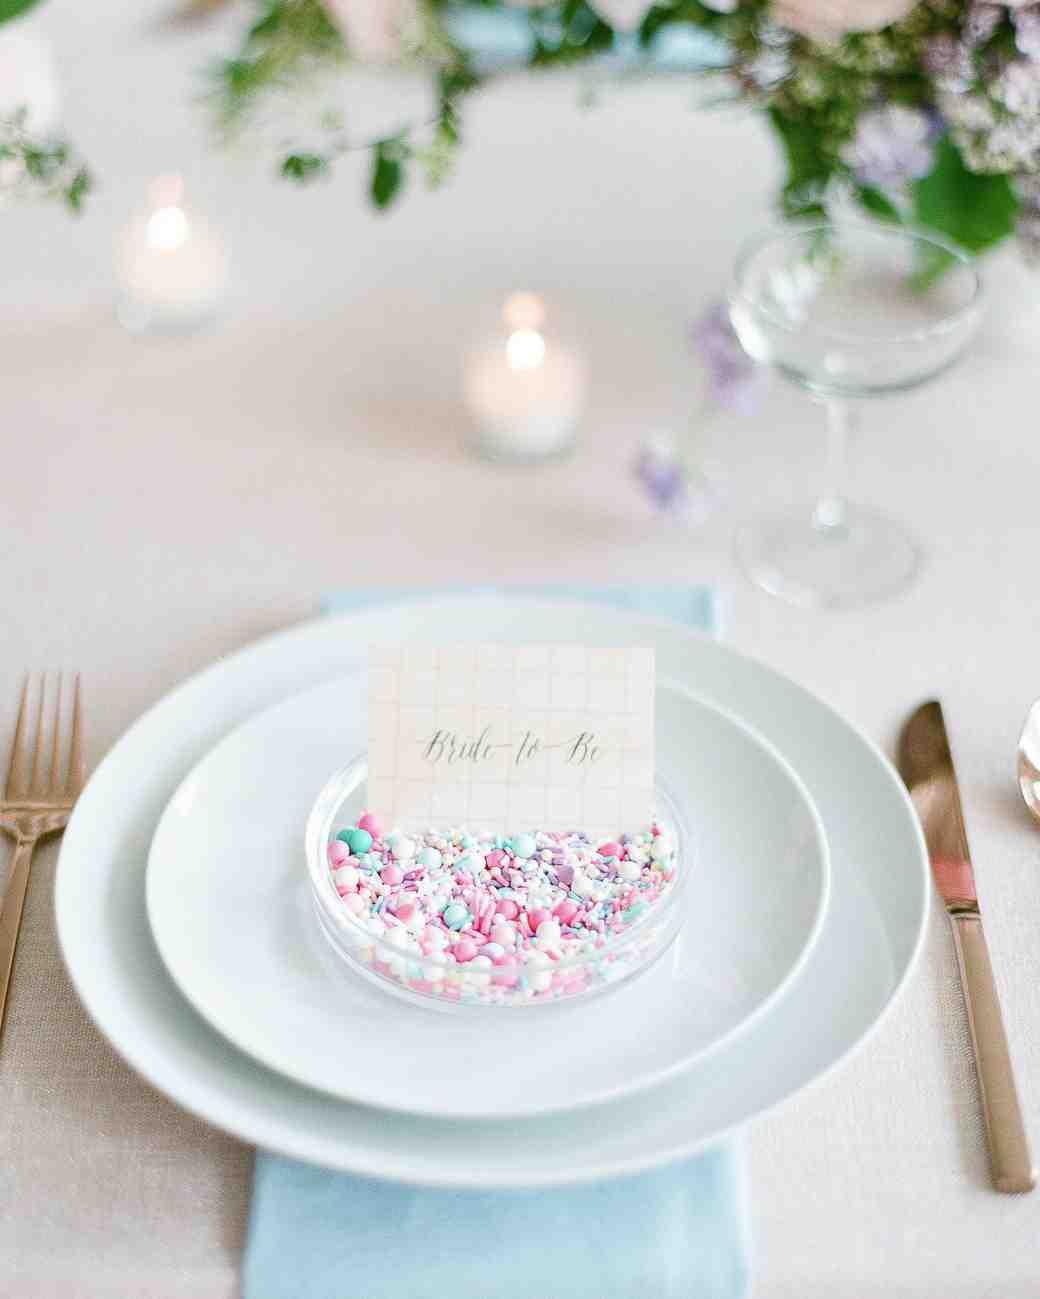 24 Unexpected Bridal Shower Ideas to Bookmark | Martha Stewart Weddings